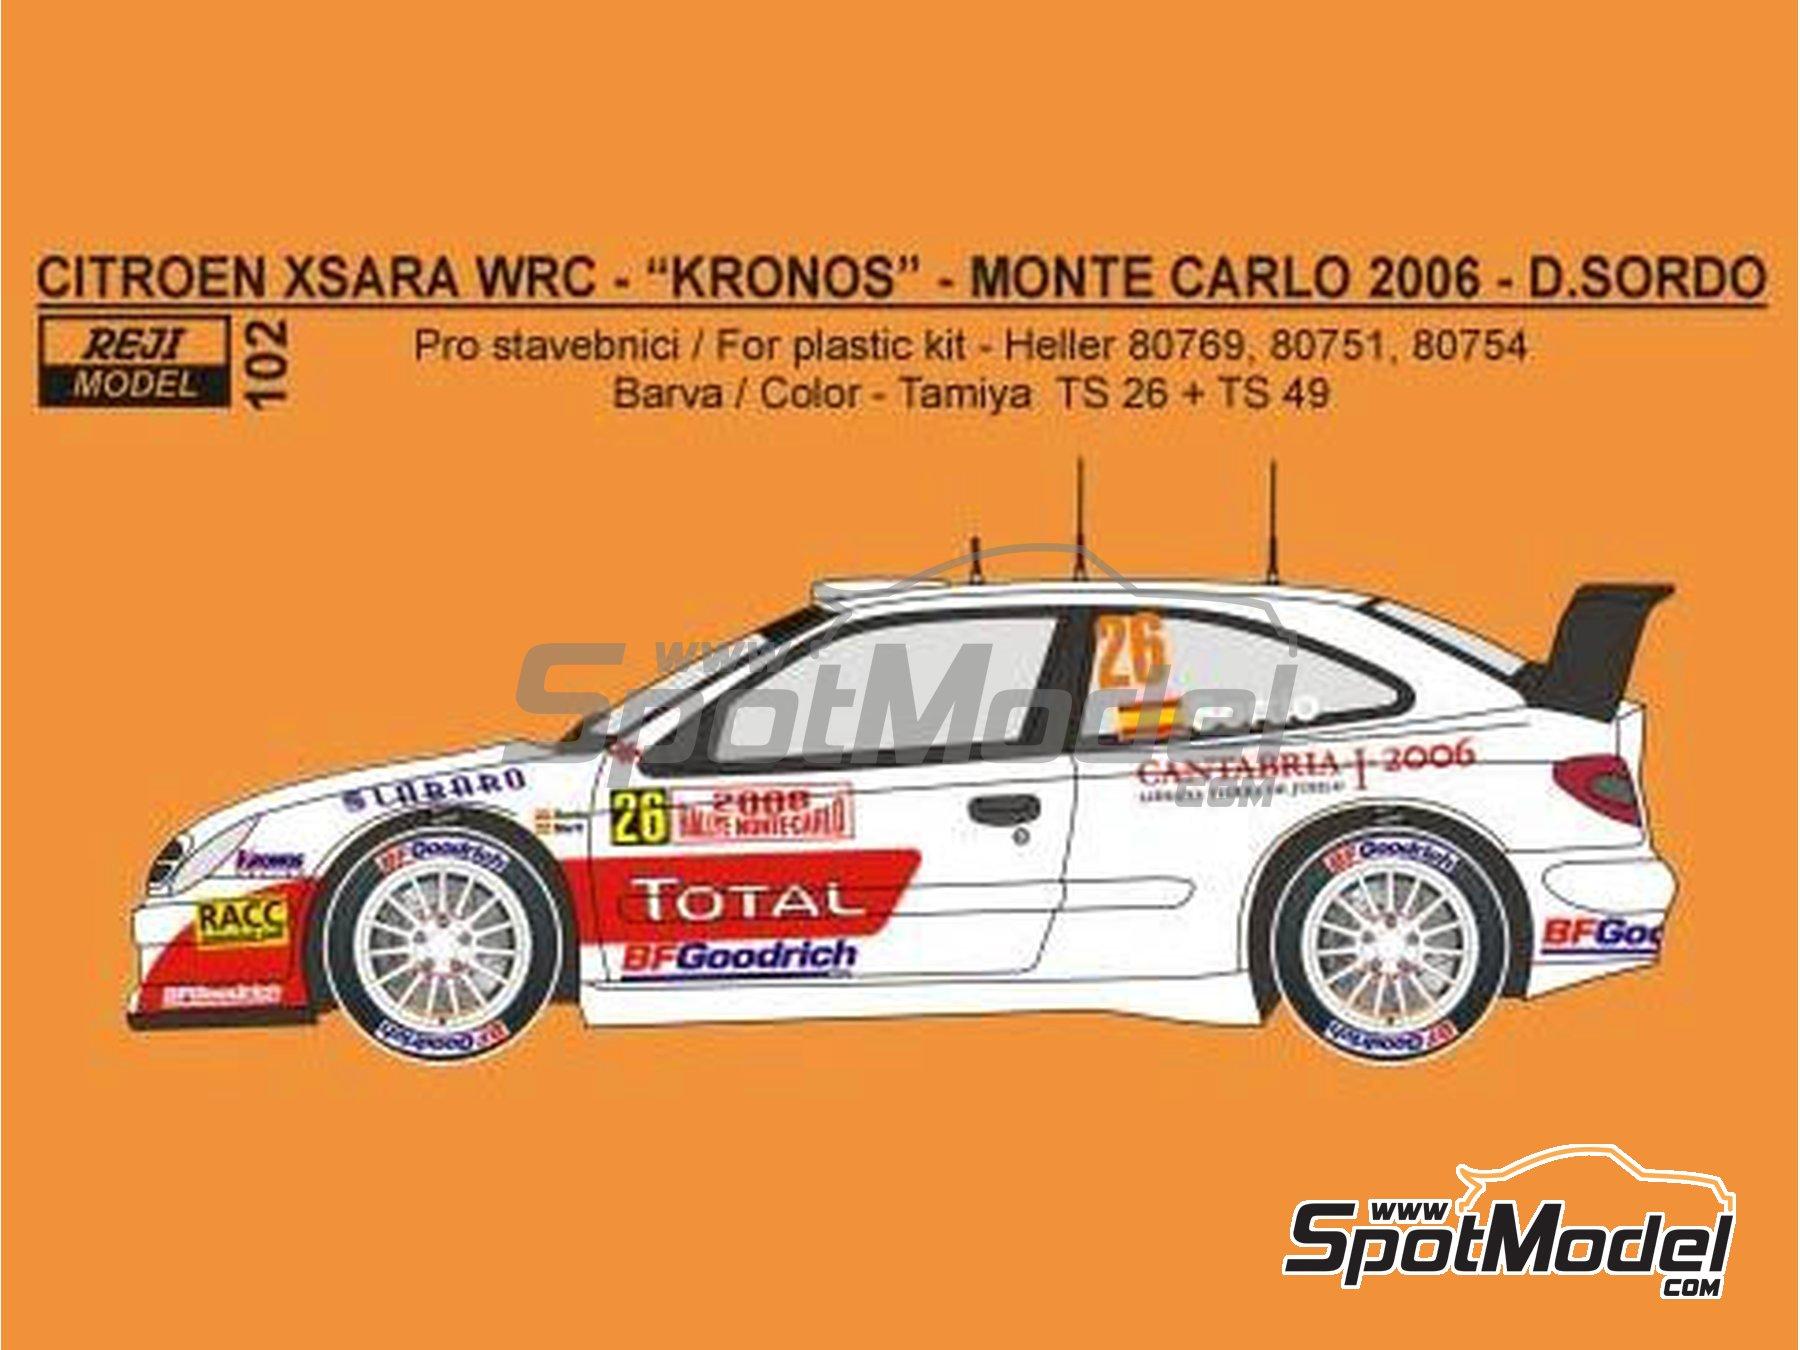 Image 1: Citroen Xsara WRC Kronos - Montecarlo Rally, Svezia Sweden Rally 2006 | Marking / livery in 1/24 scale manufactured by Reji Model (ref.REJI-102)